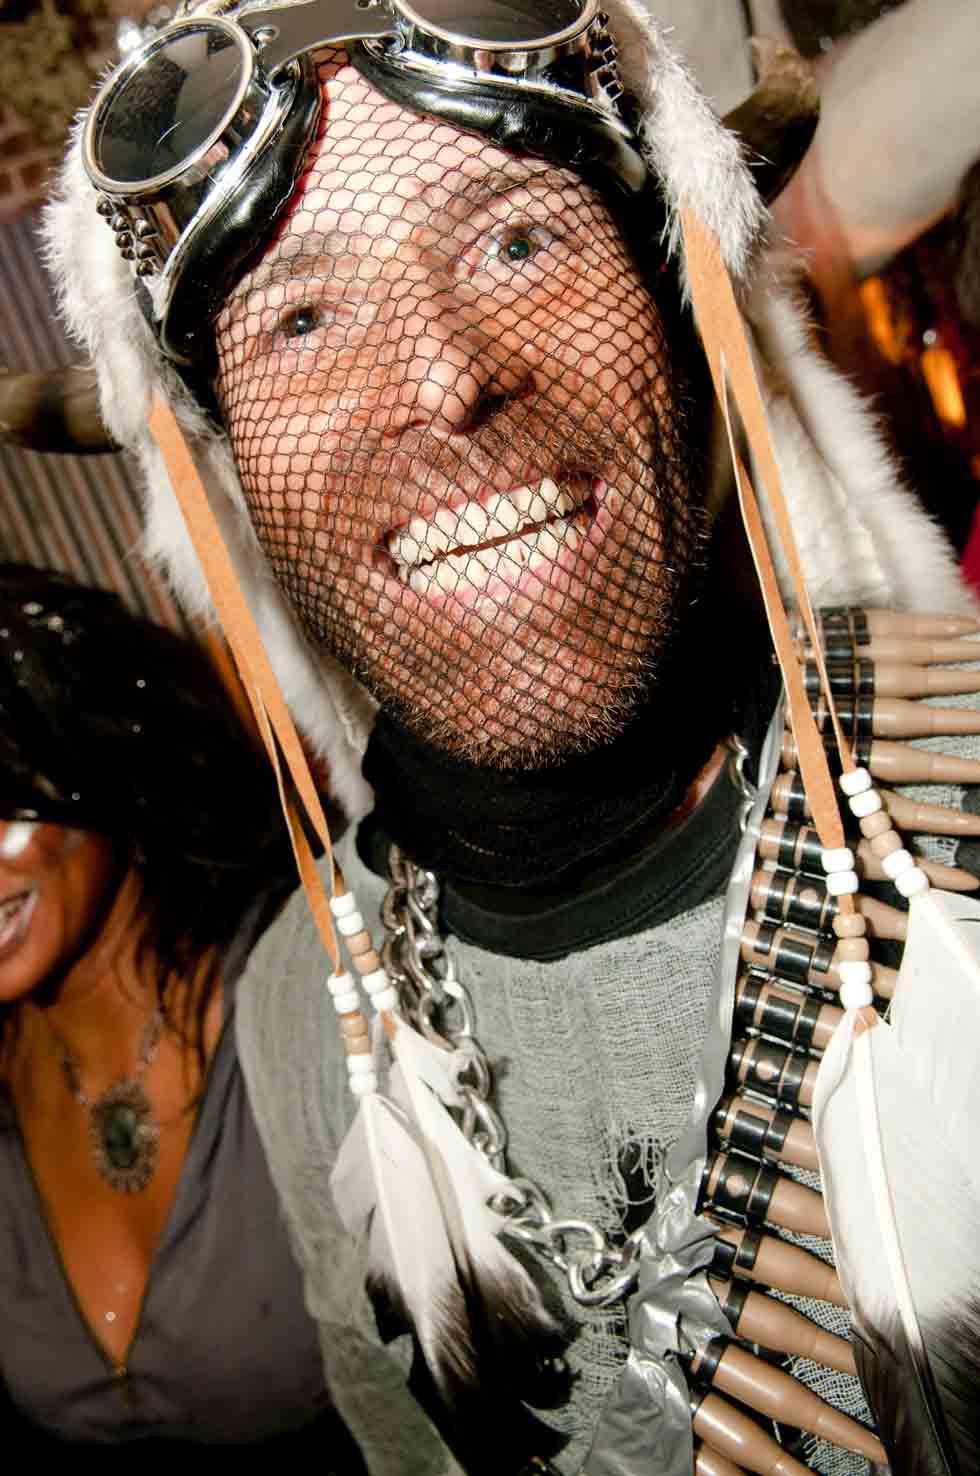 zum-schneider-nyc-2012-karneval-apocalyptika-3889.jpg